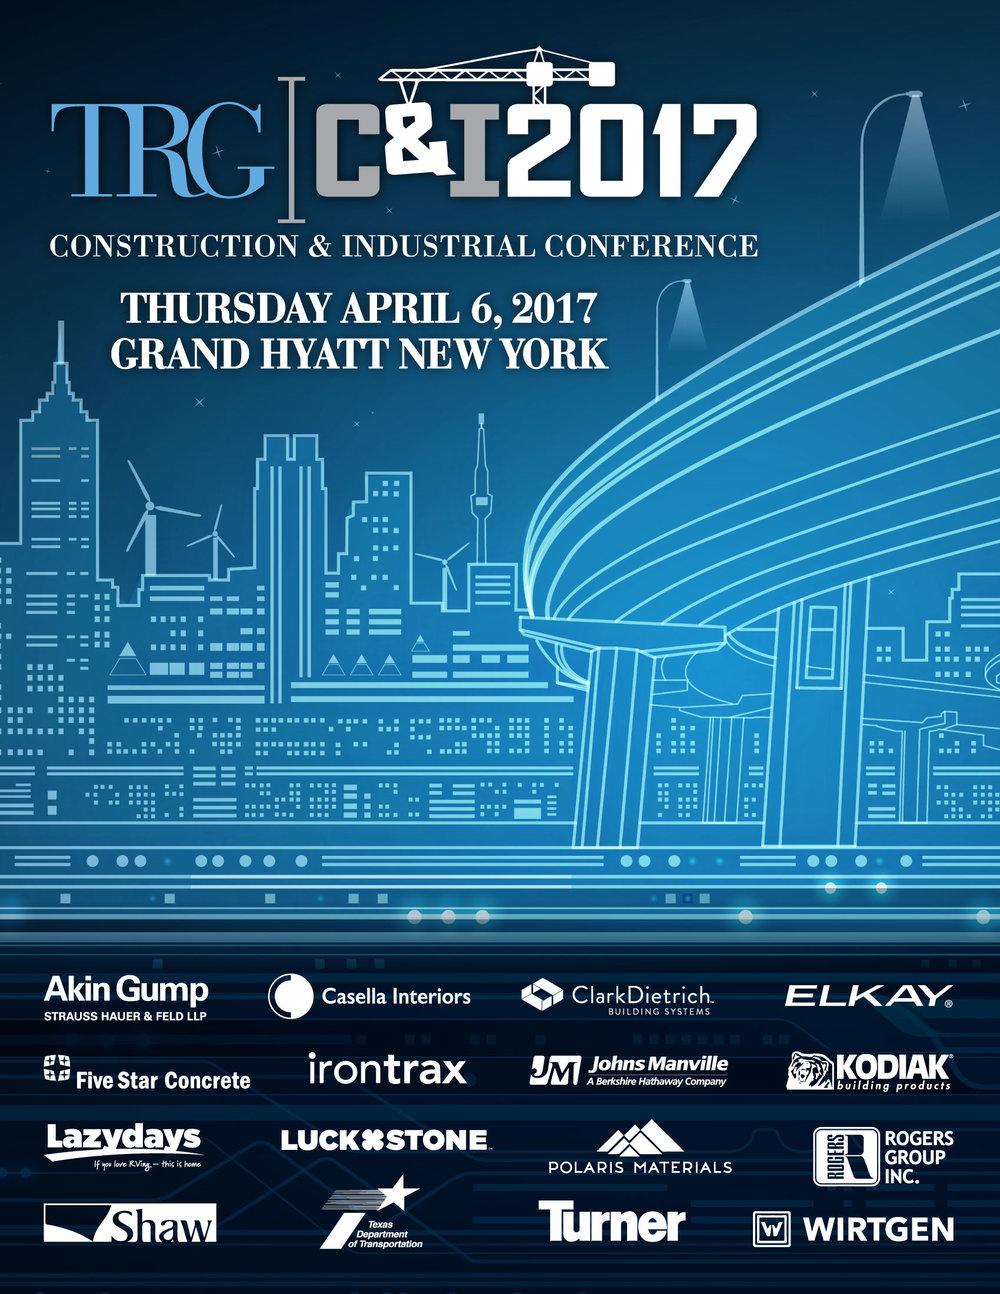 TRG_C&I2017_LTR-lg.jpg